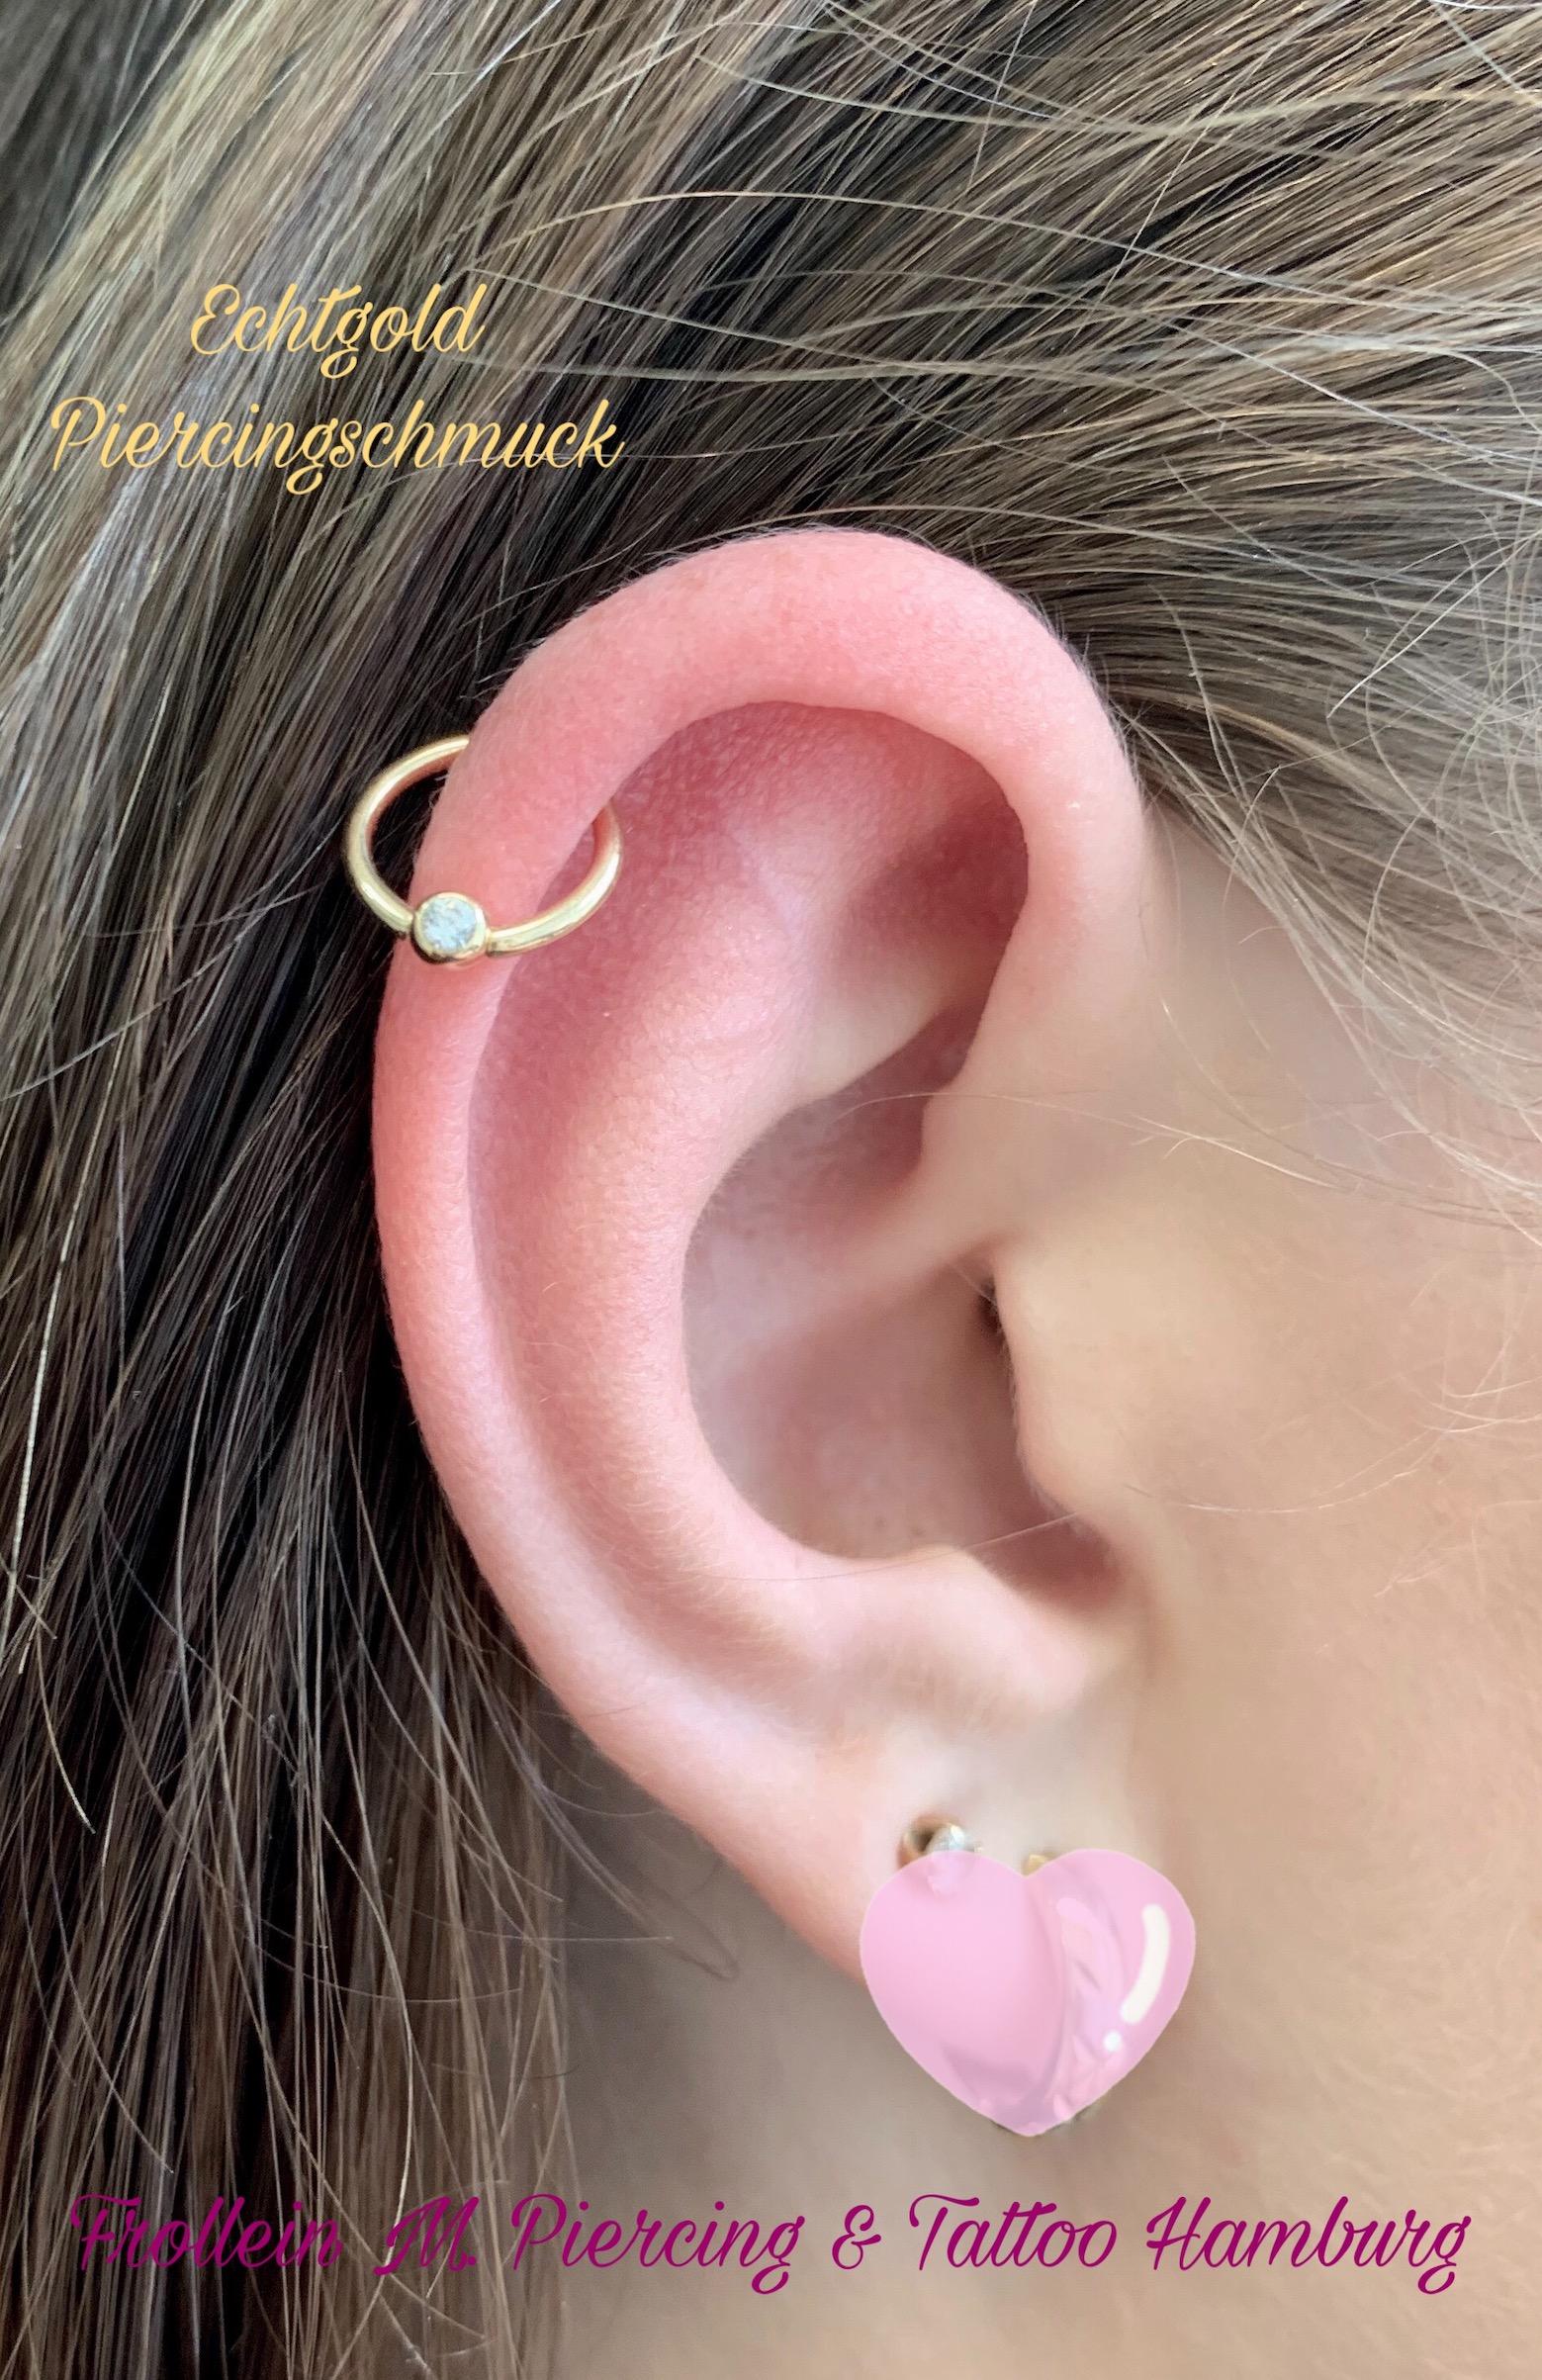 Entzündet christina piercing Piercing entzündet: